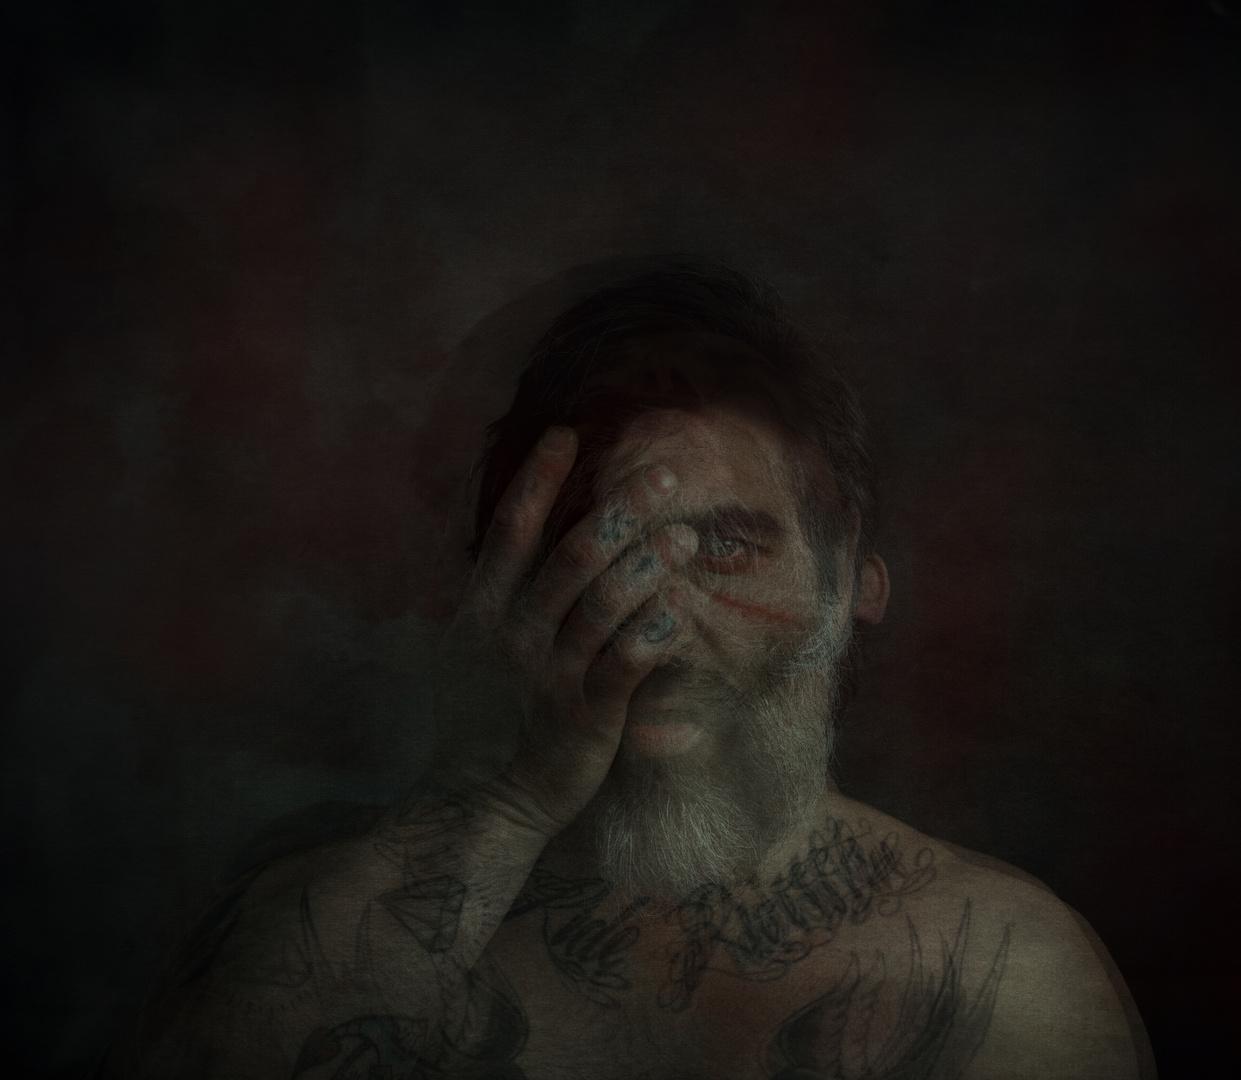 Subjetive emotional perception